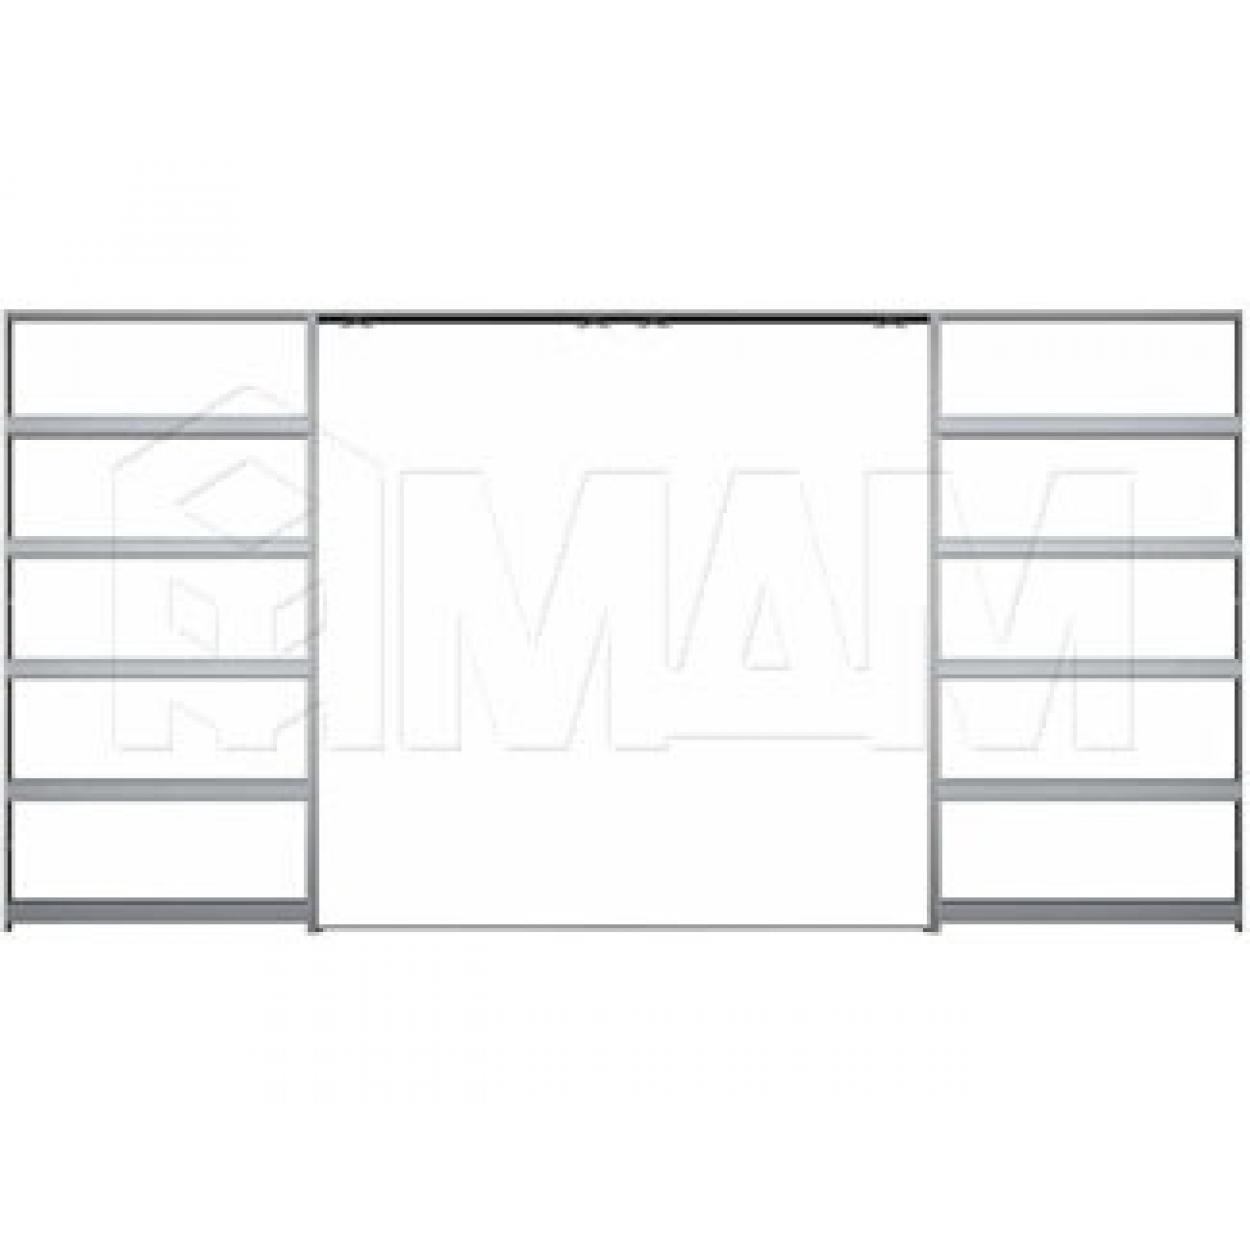 GUSTAVSON Пенал для двух дверей, толщина 125 мм